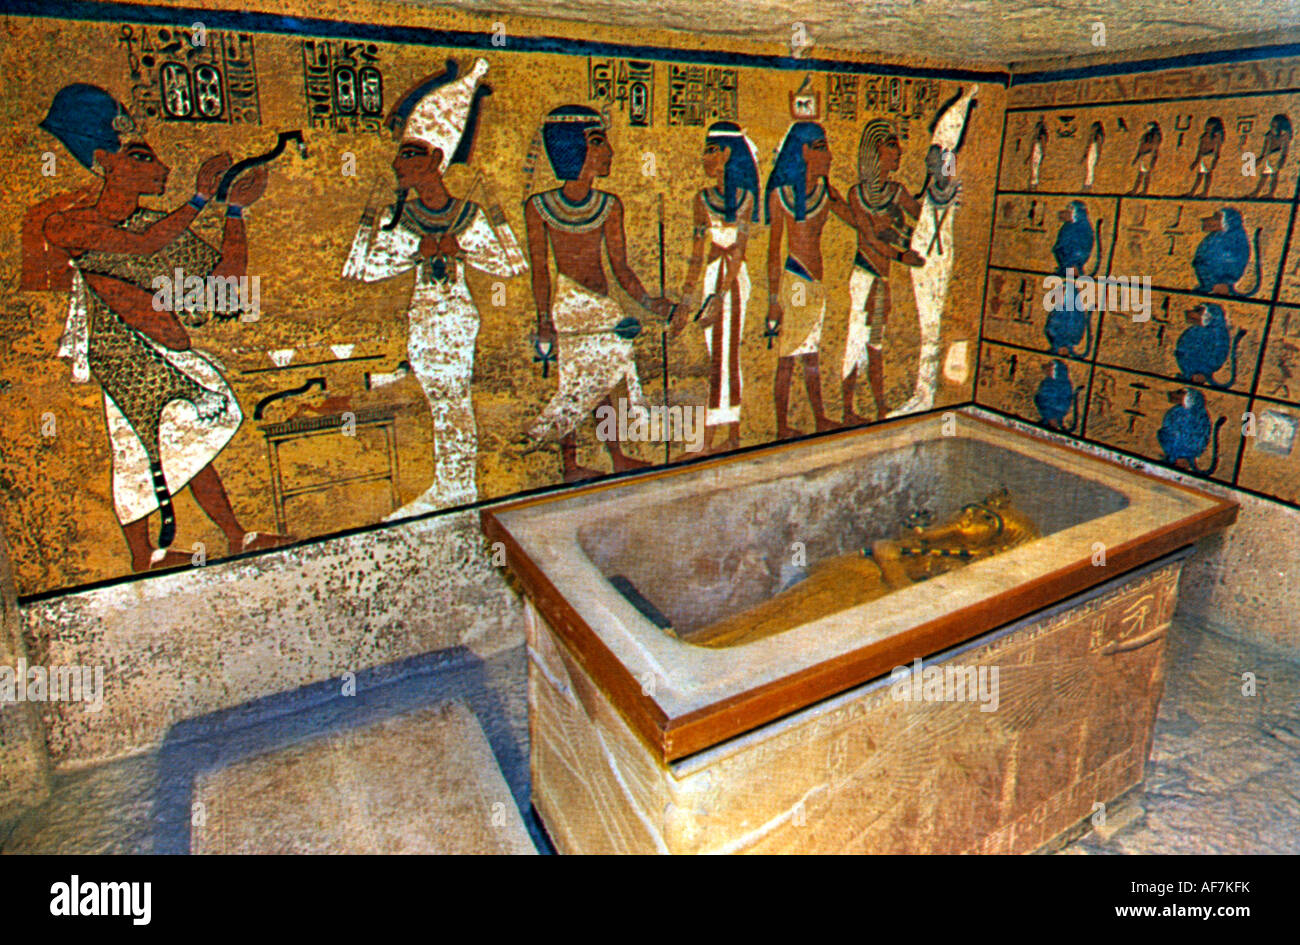 Egypt Tomb Of The Kings Mummy Of Tutankhamun In Golden Coffin - Stock Image